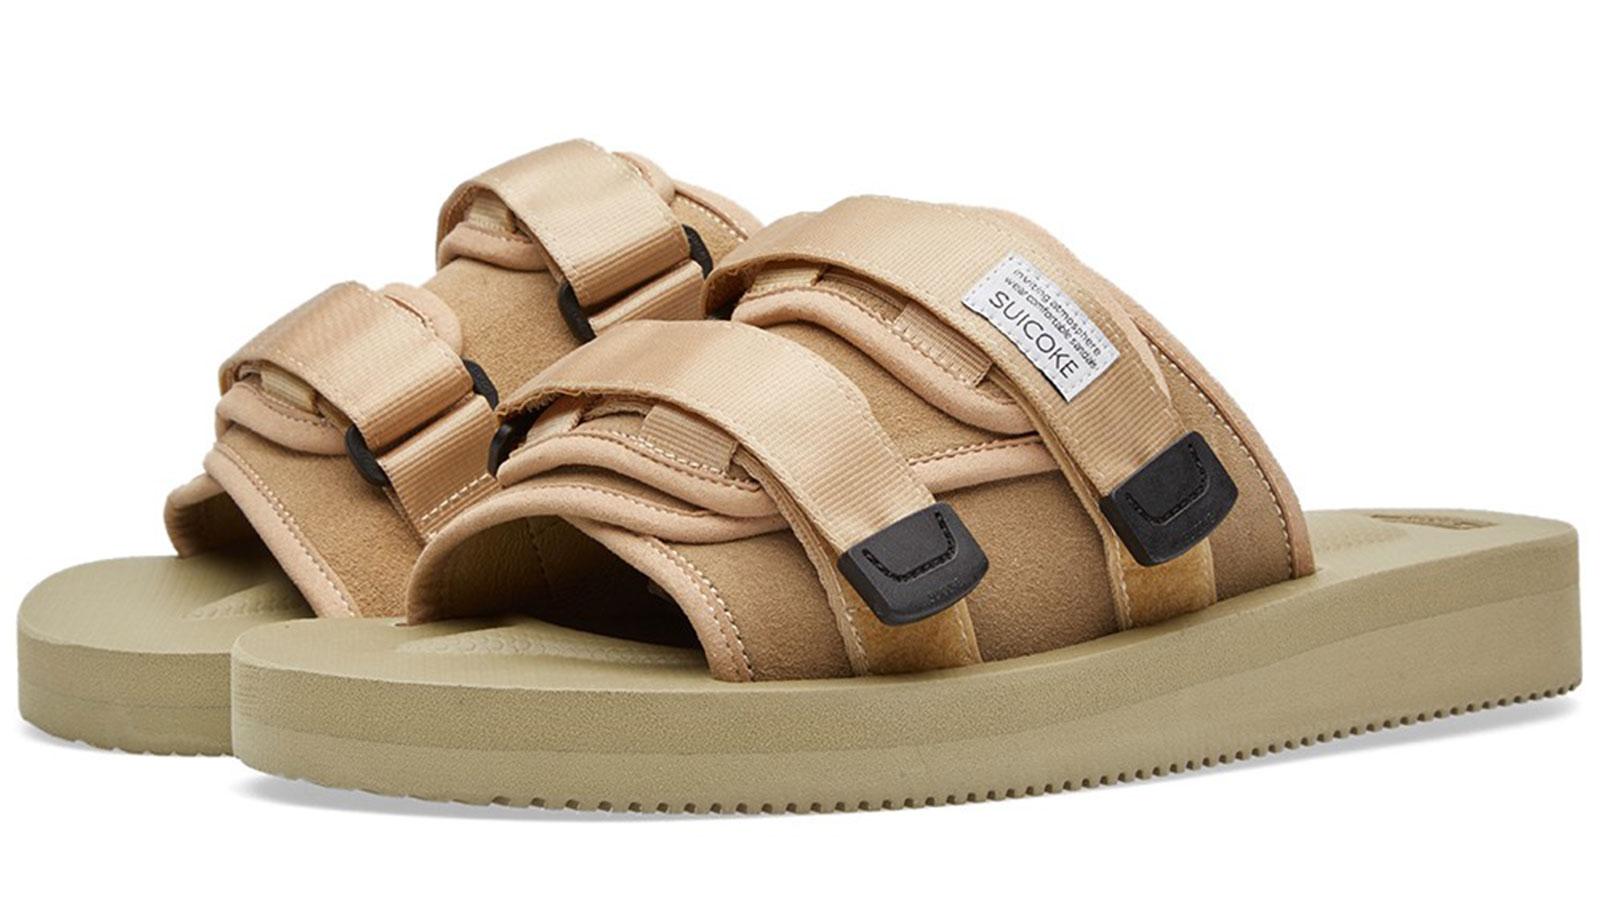 Suicoke Moto VS best sandals for men